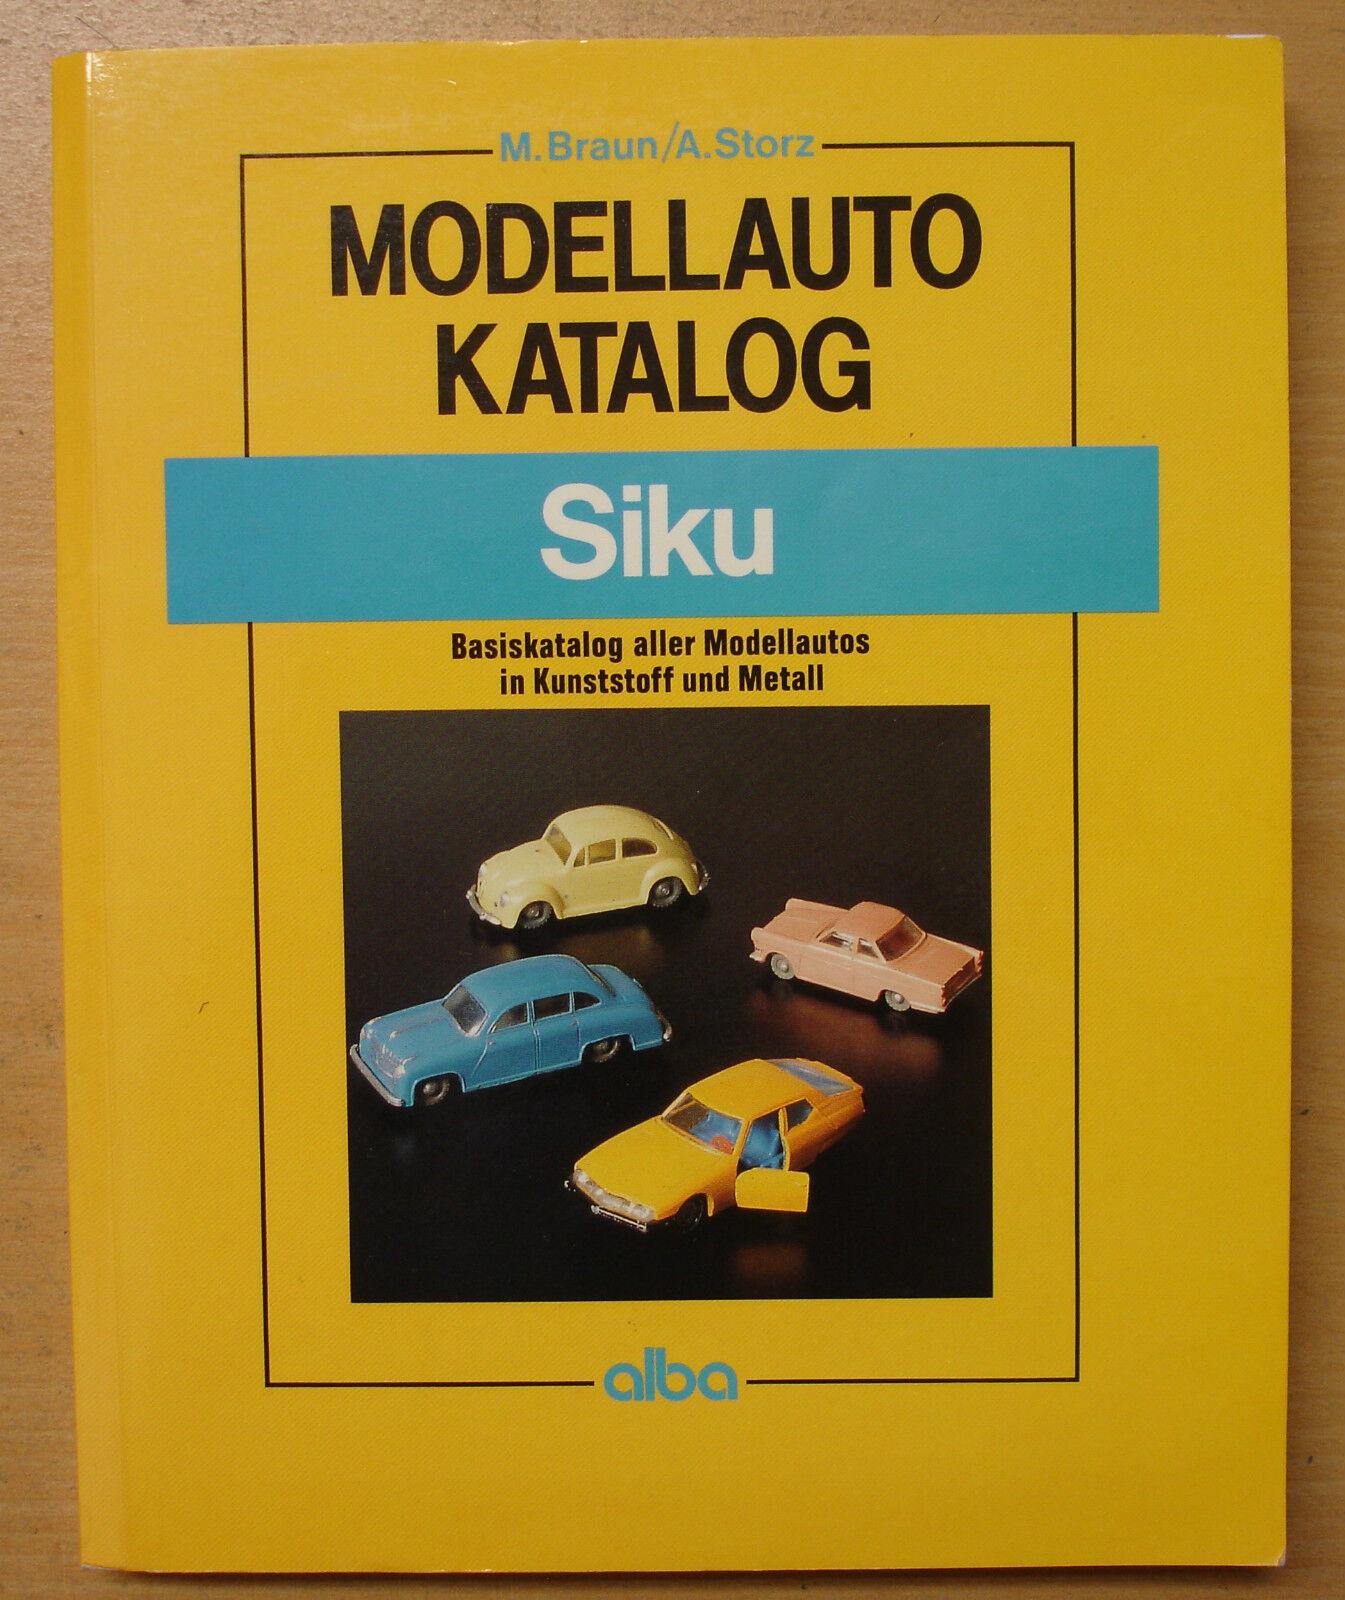 Voiture miniature catalogue siku modèle voitures modèles voitures catalogue tarif LIVRE BOOK